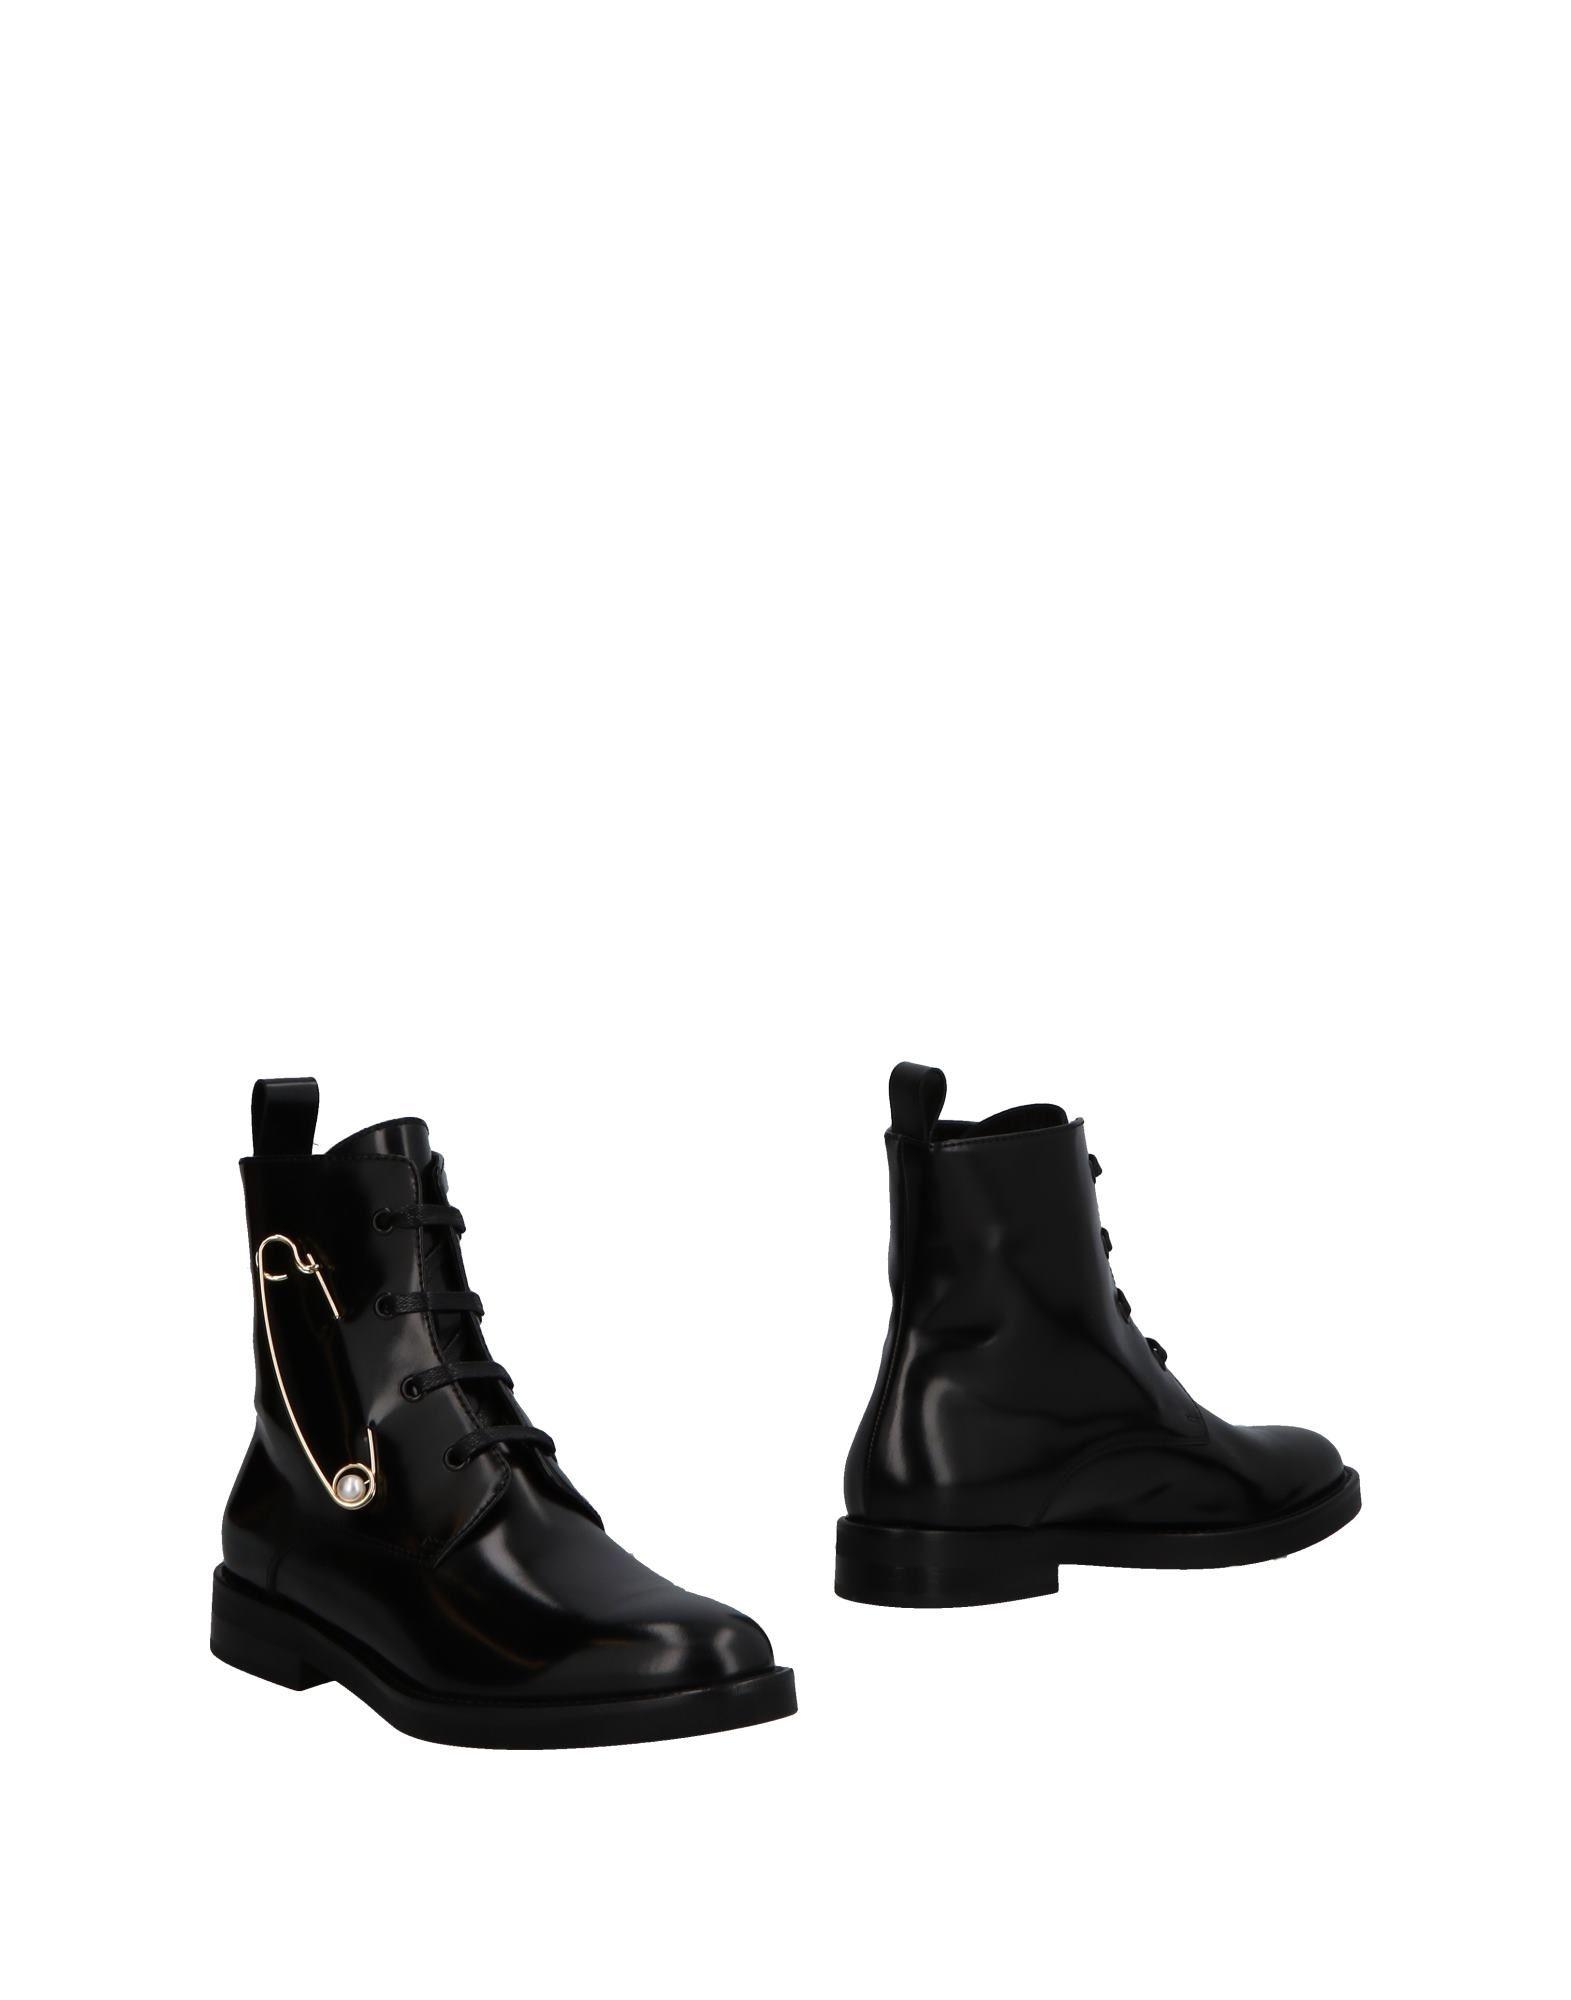 Coliac Martina Grasselli Ankle Ankle Ankle Boot - Women Coliac Martina Grasselli Ankle Boots online on  United Kingdom - 11505309AC 2c7dfe